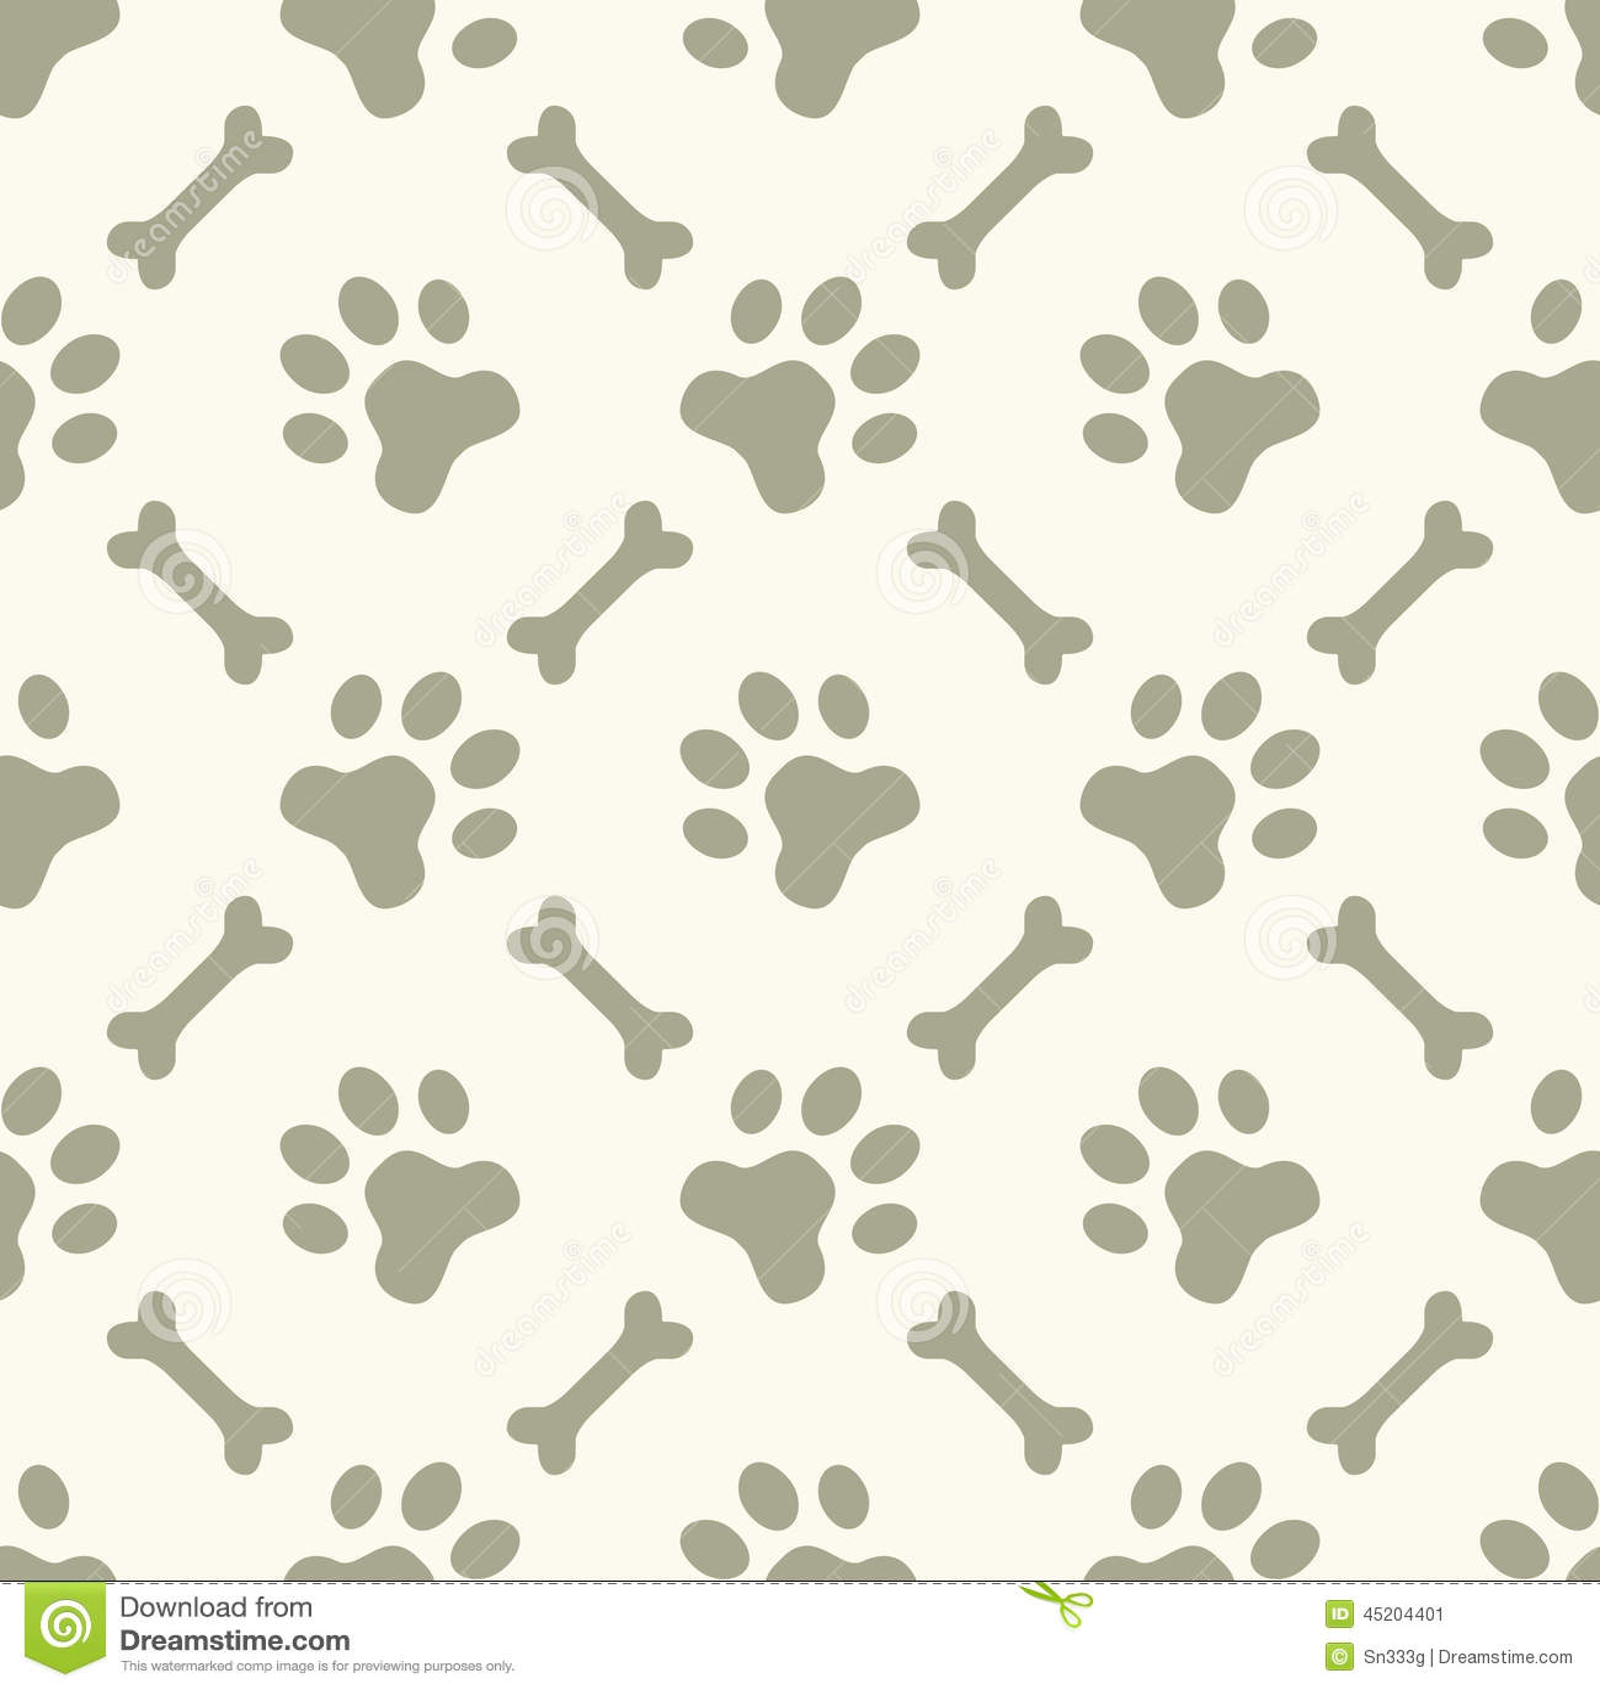 Dog Paw Footprint Seamless Pattern Stock Vector Image